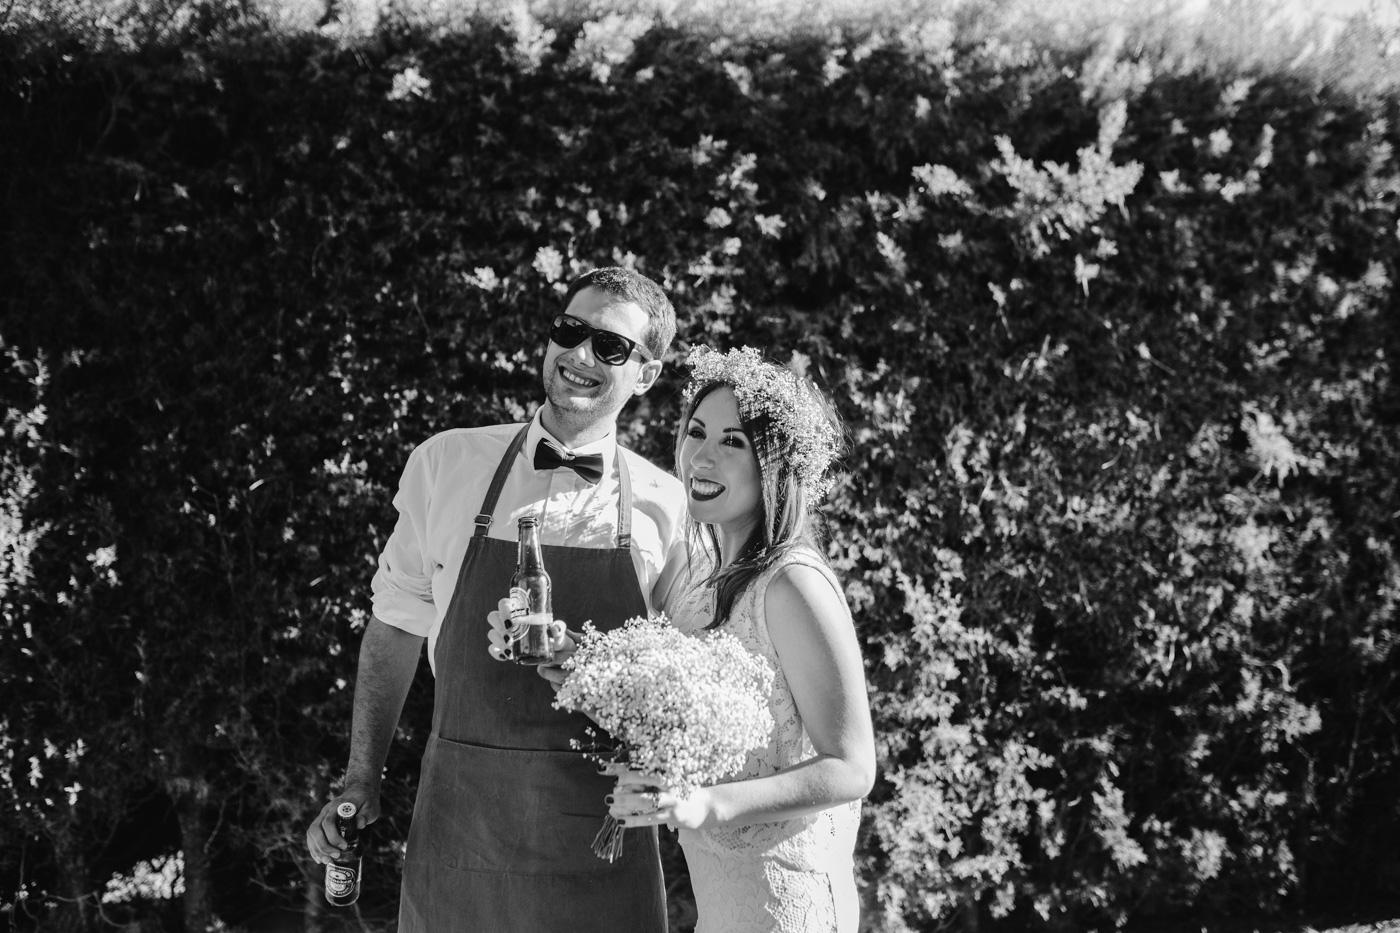 Velvet-Hush-fotografos-boda-al-aire-libre-madrid-062